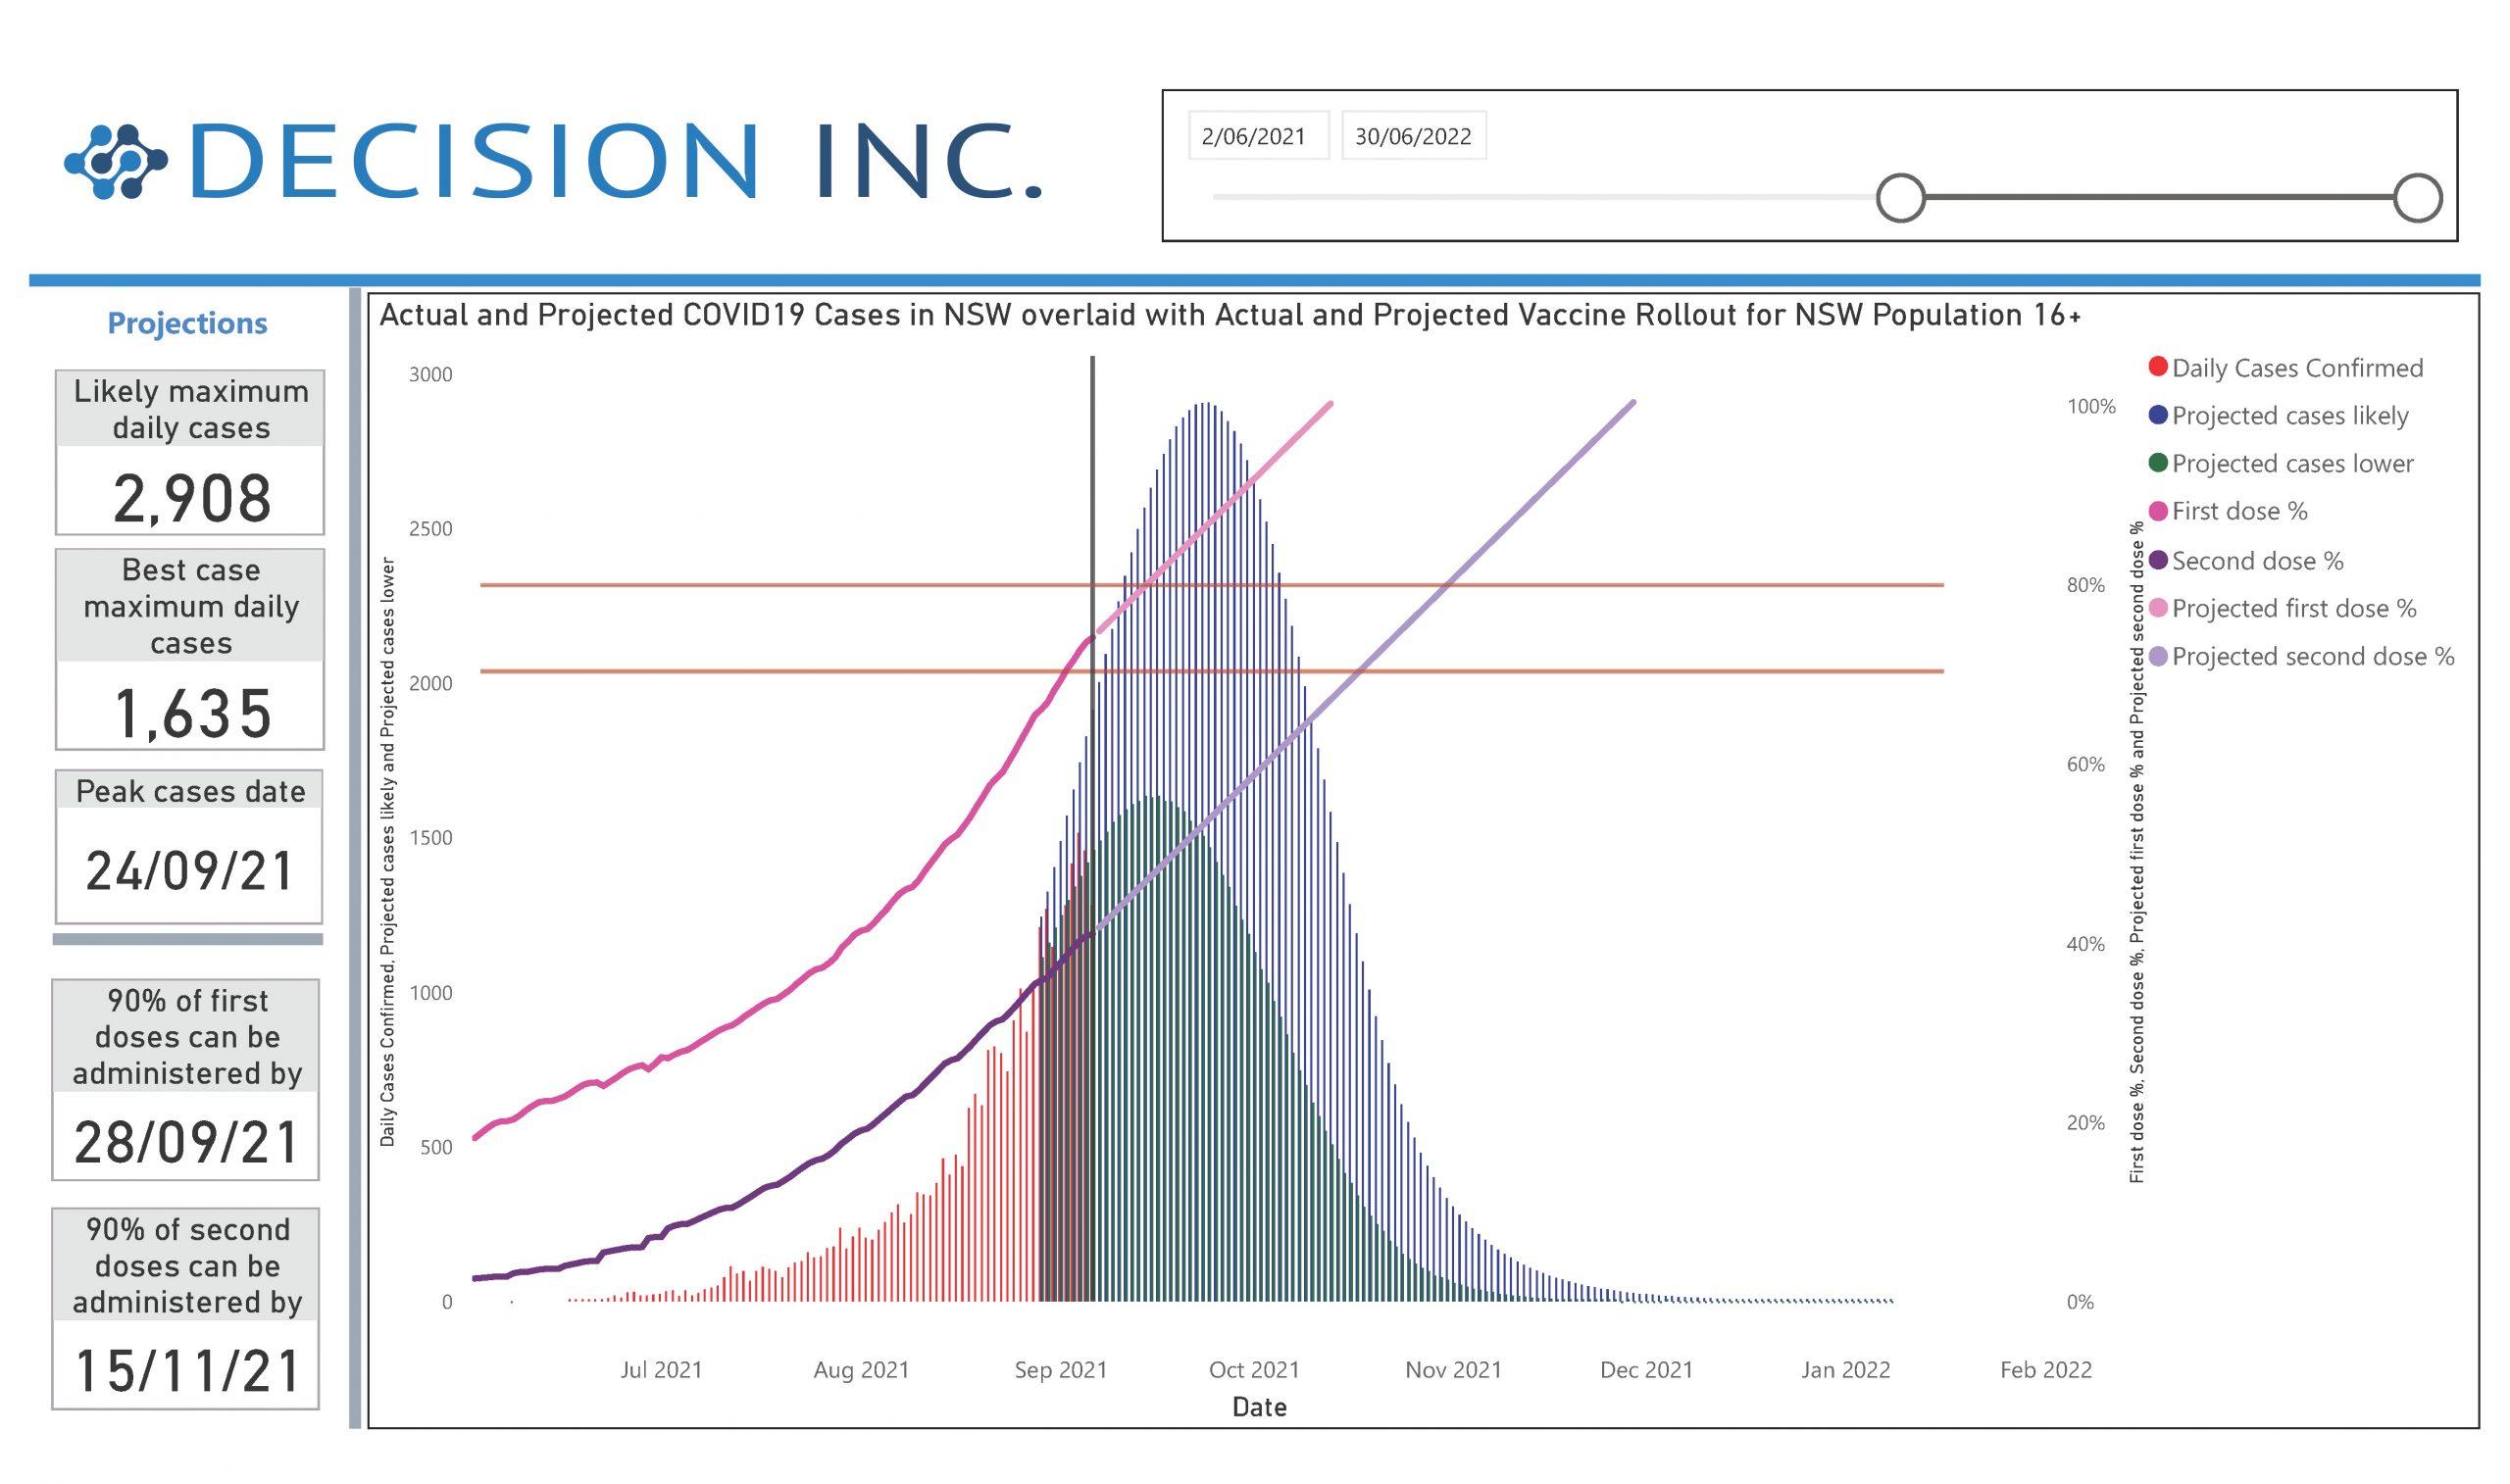 Analytics_Covid_Vaccination_Decision Inc_